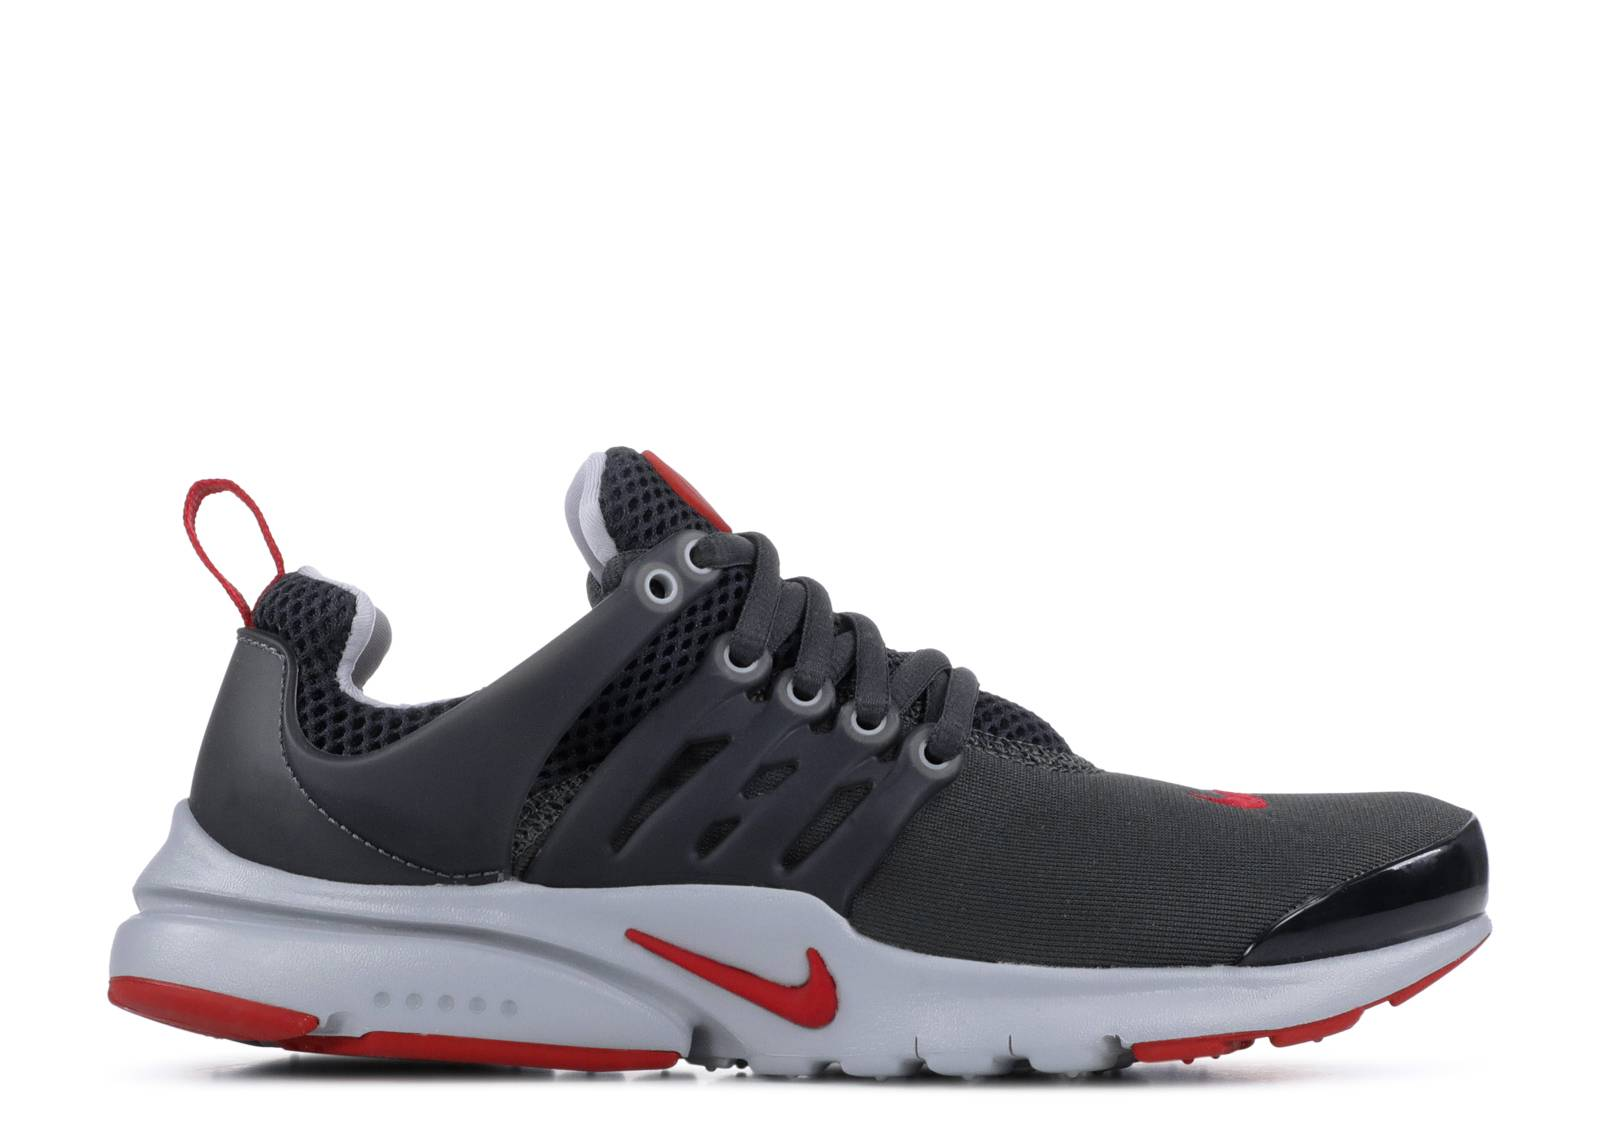 Nike Air Presto GS 'Anthracite'